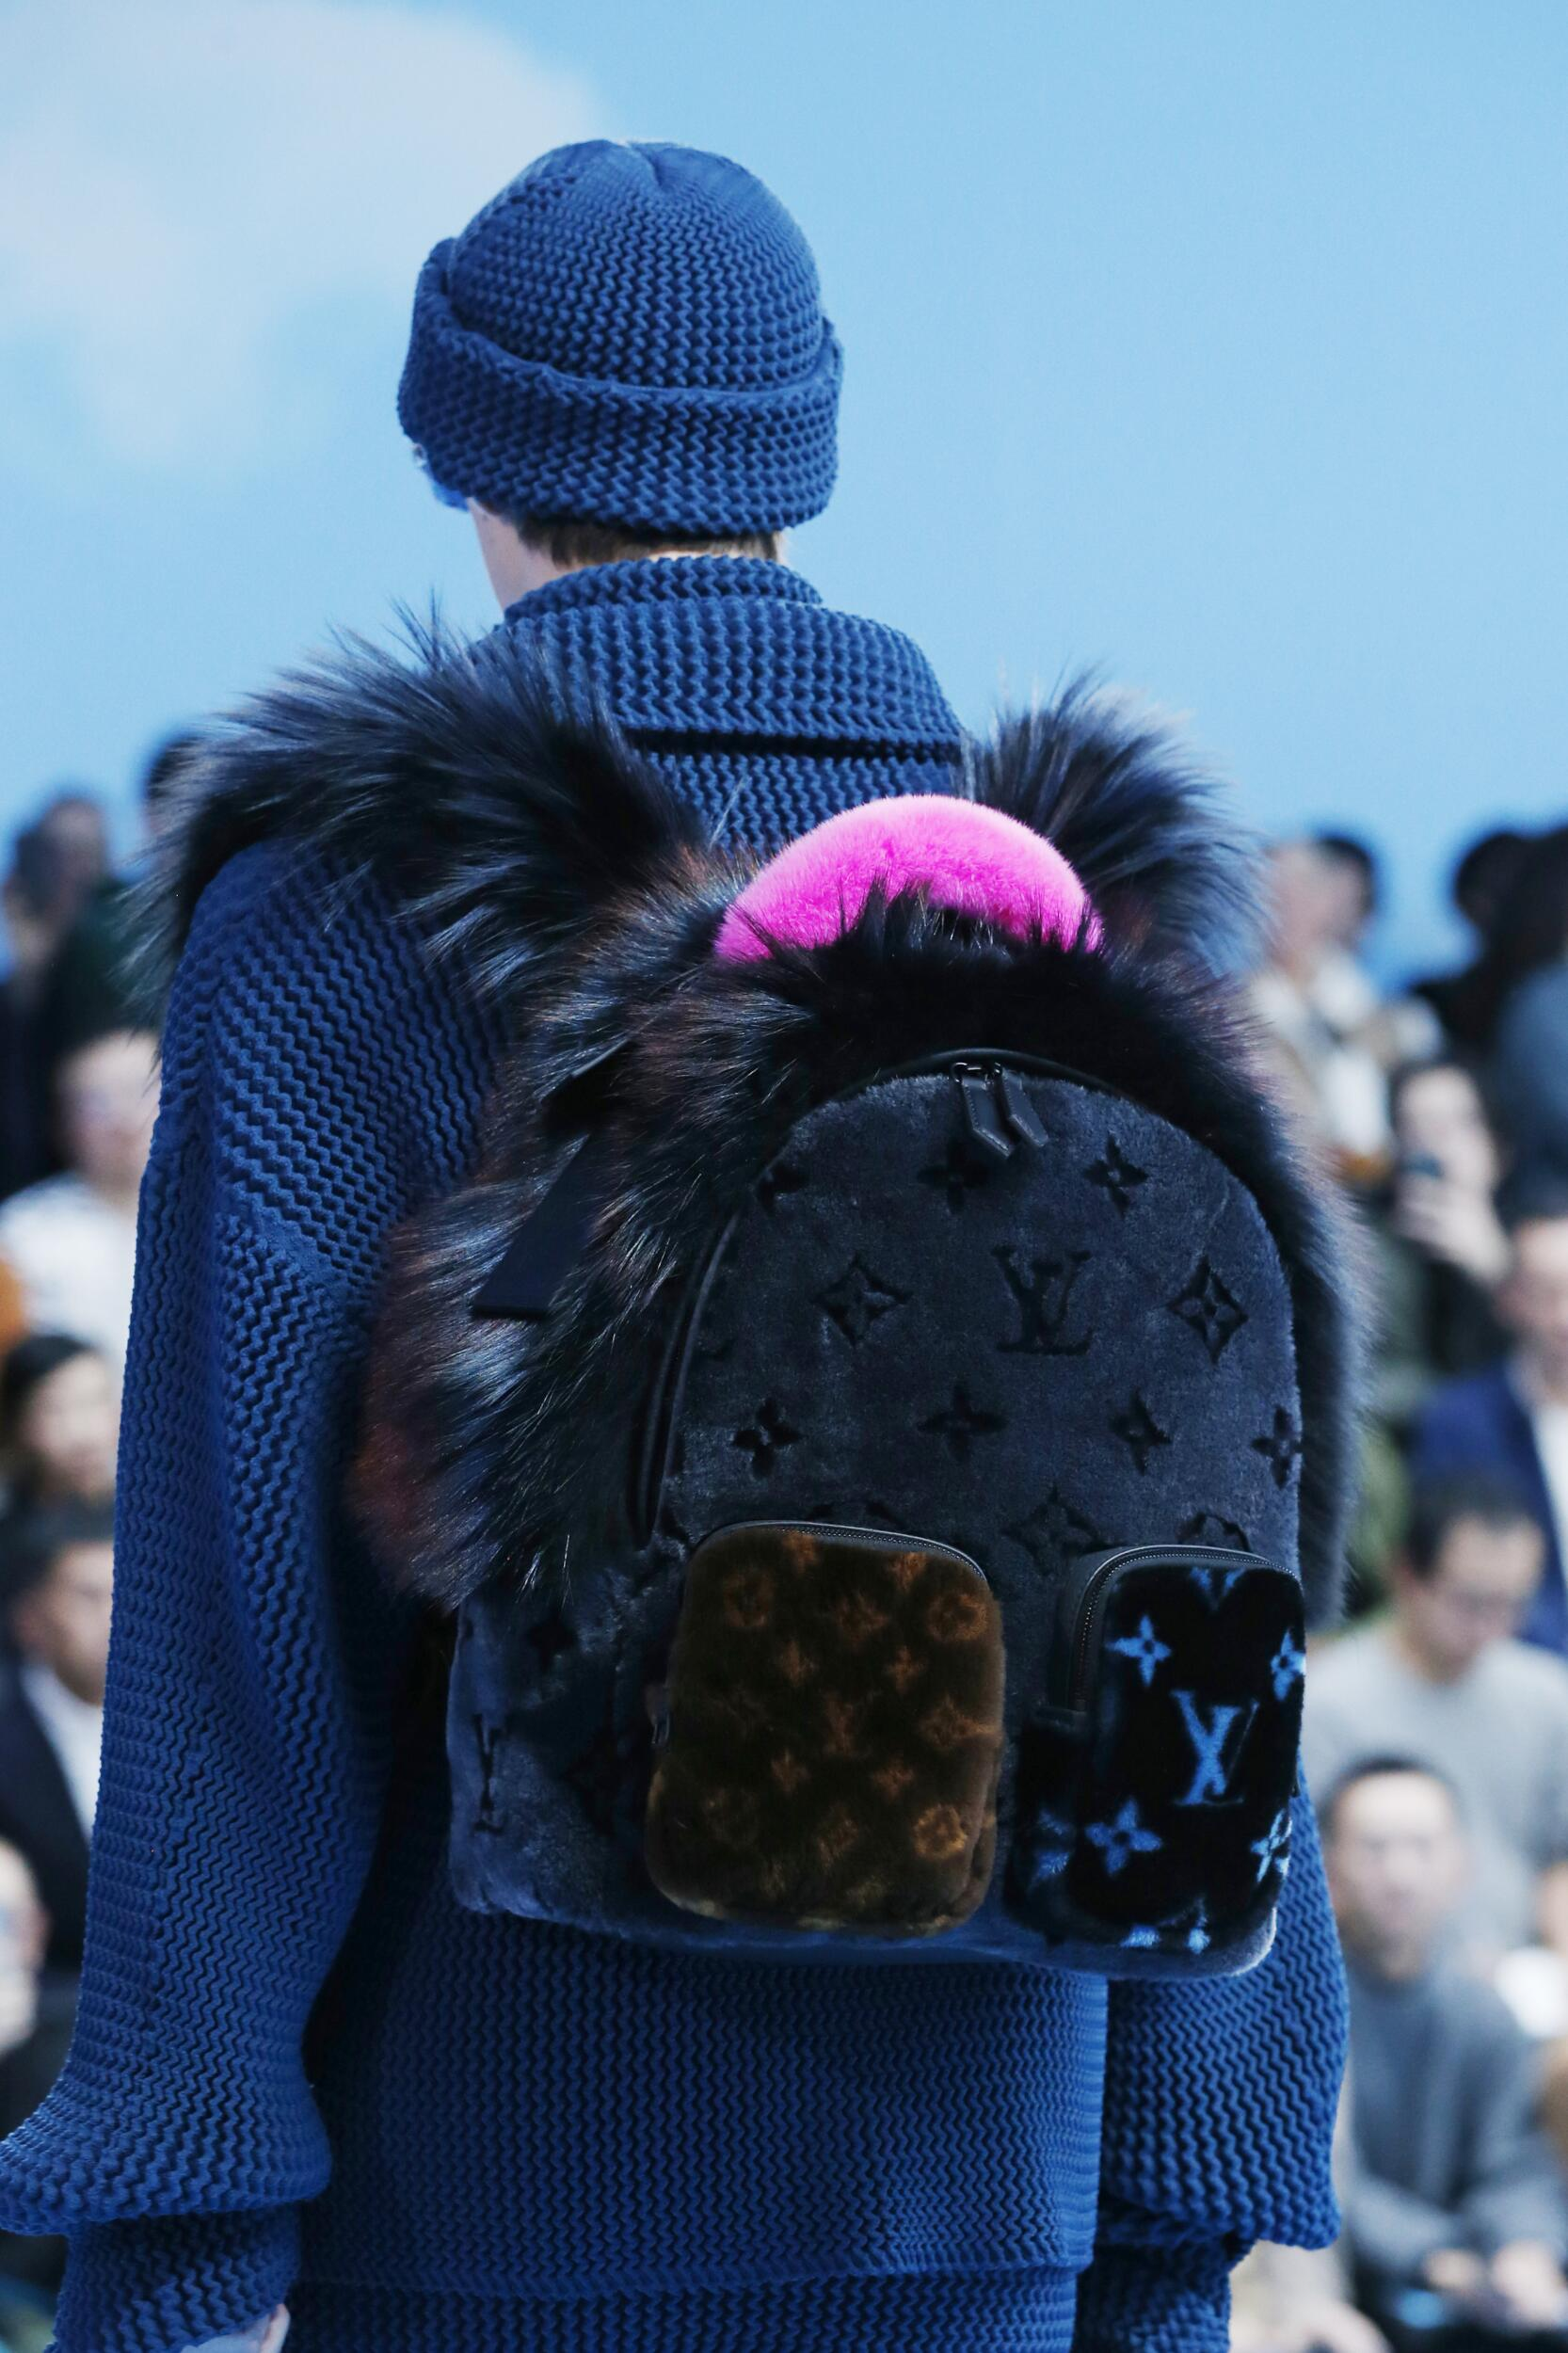 Detail Louis Vuitton Fall Winter 2020 Collection